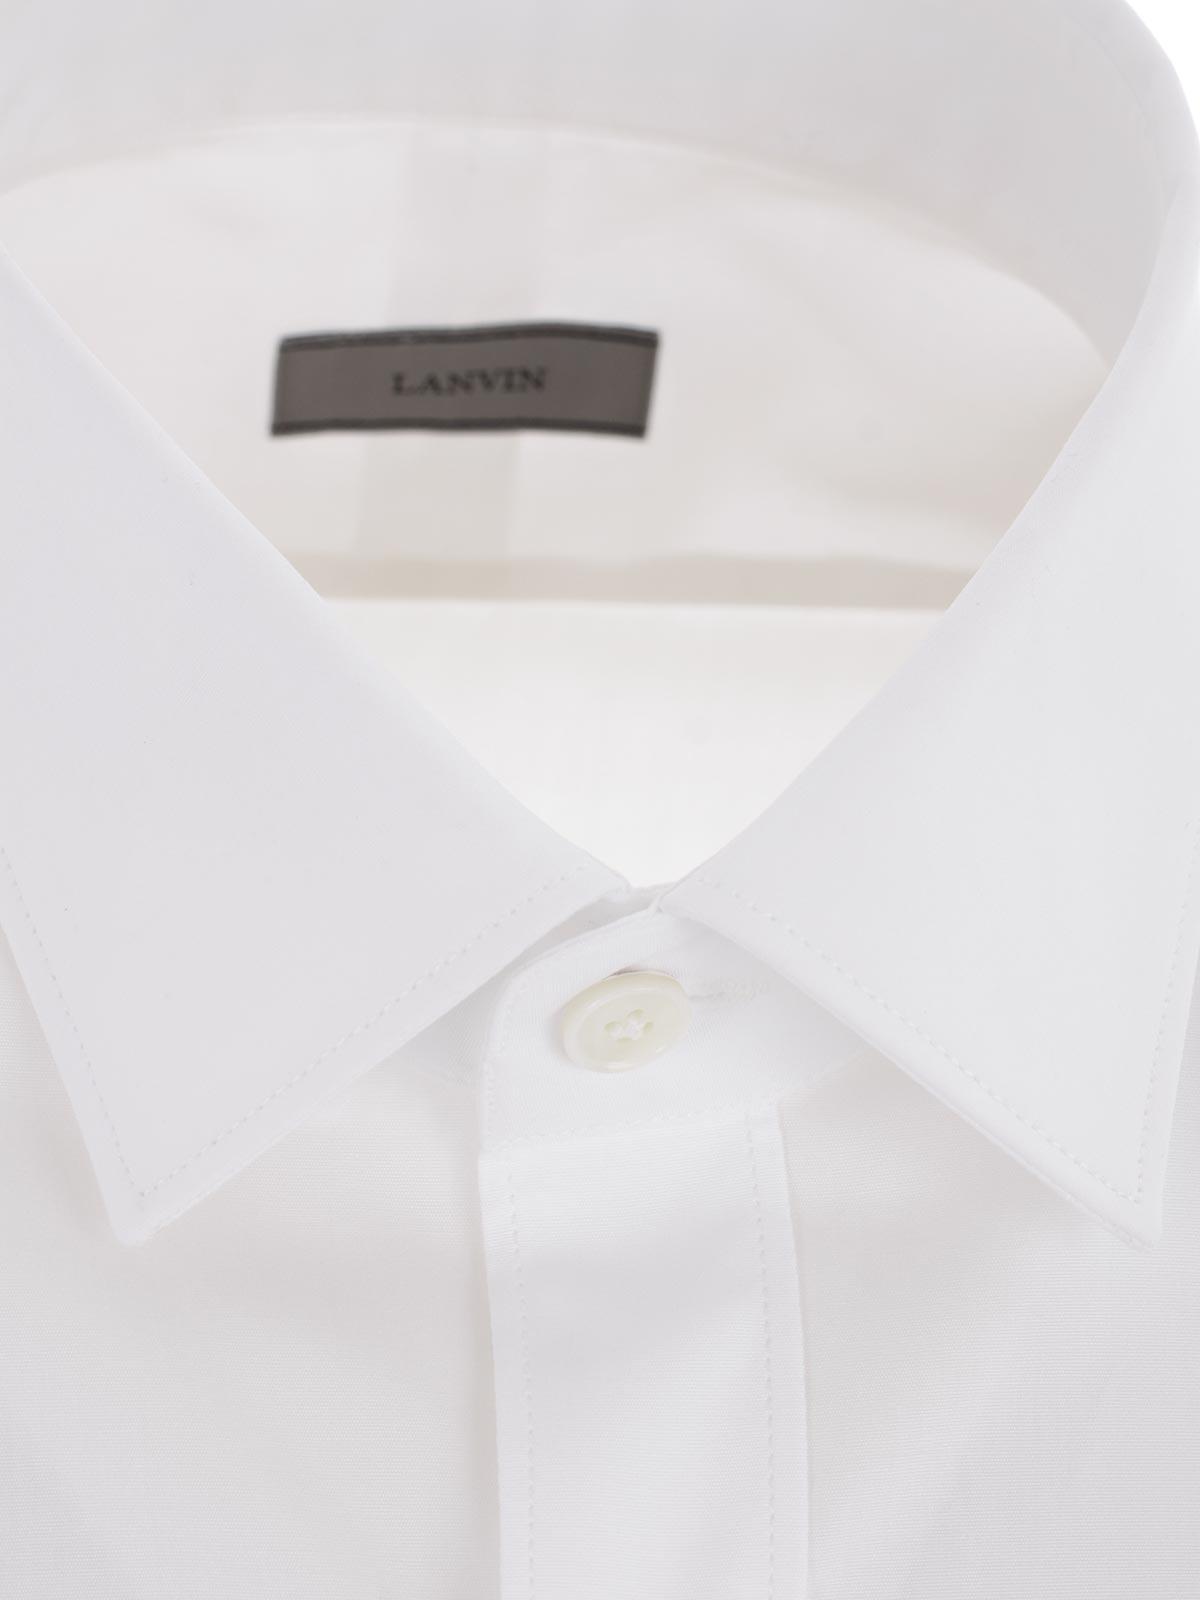 Picture of Lanvin Striped